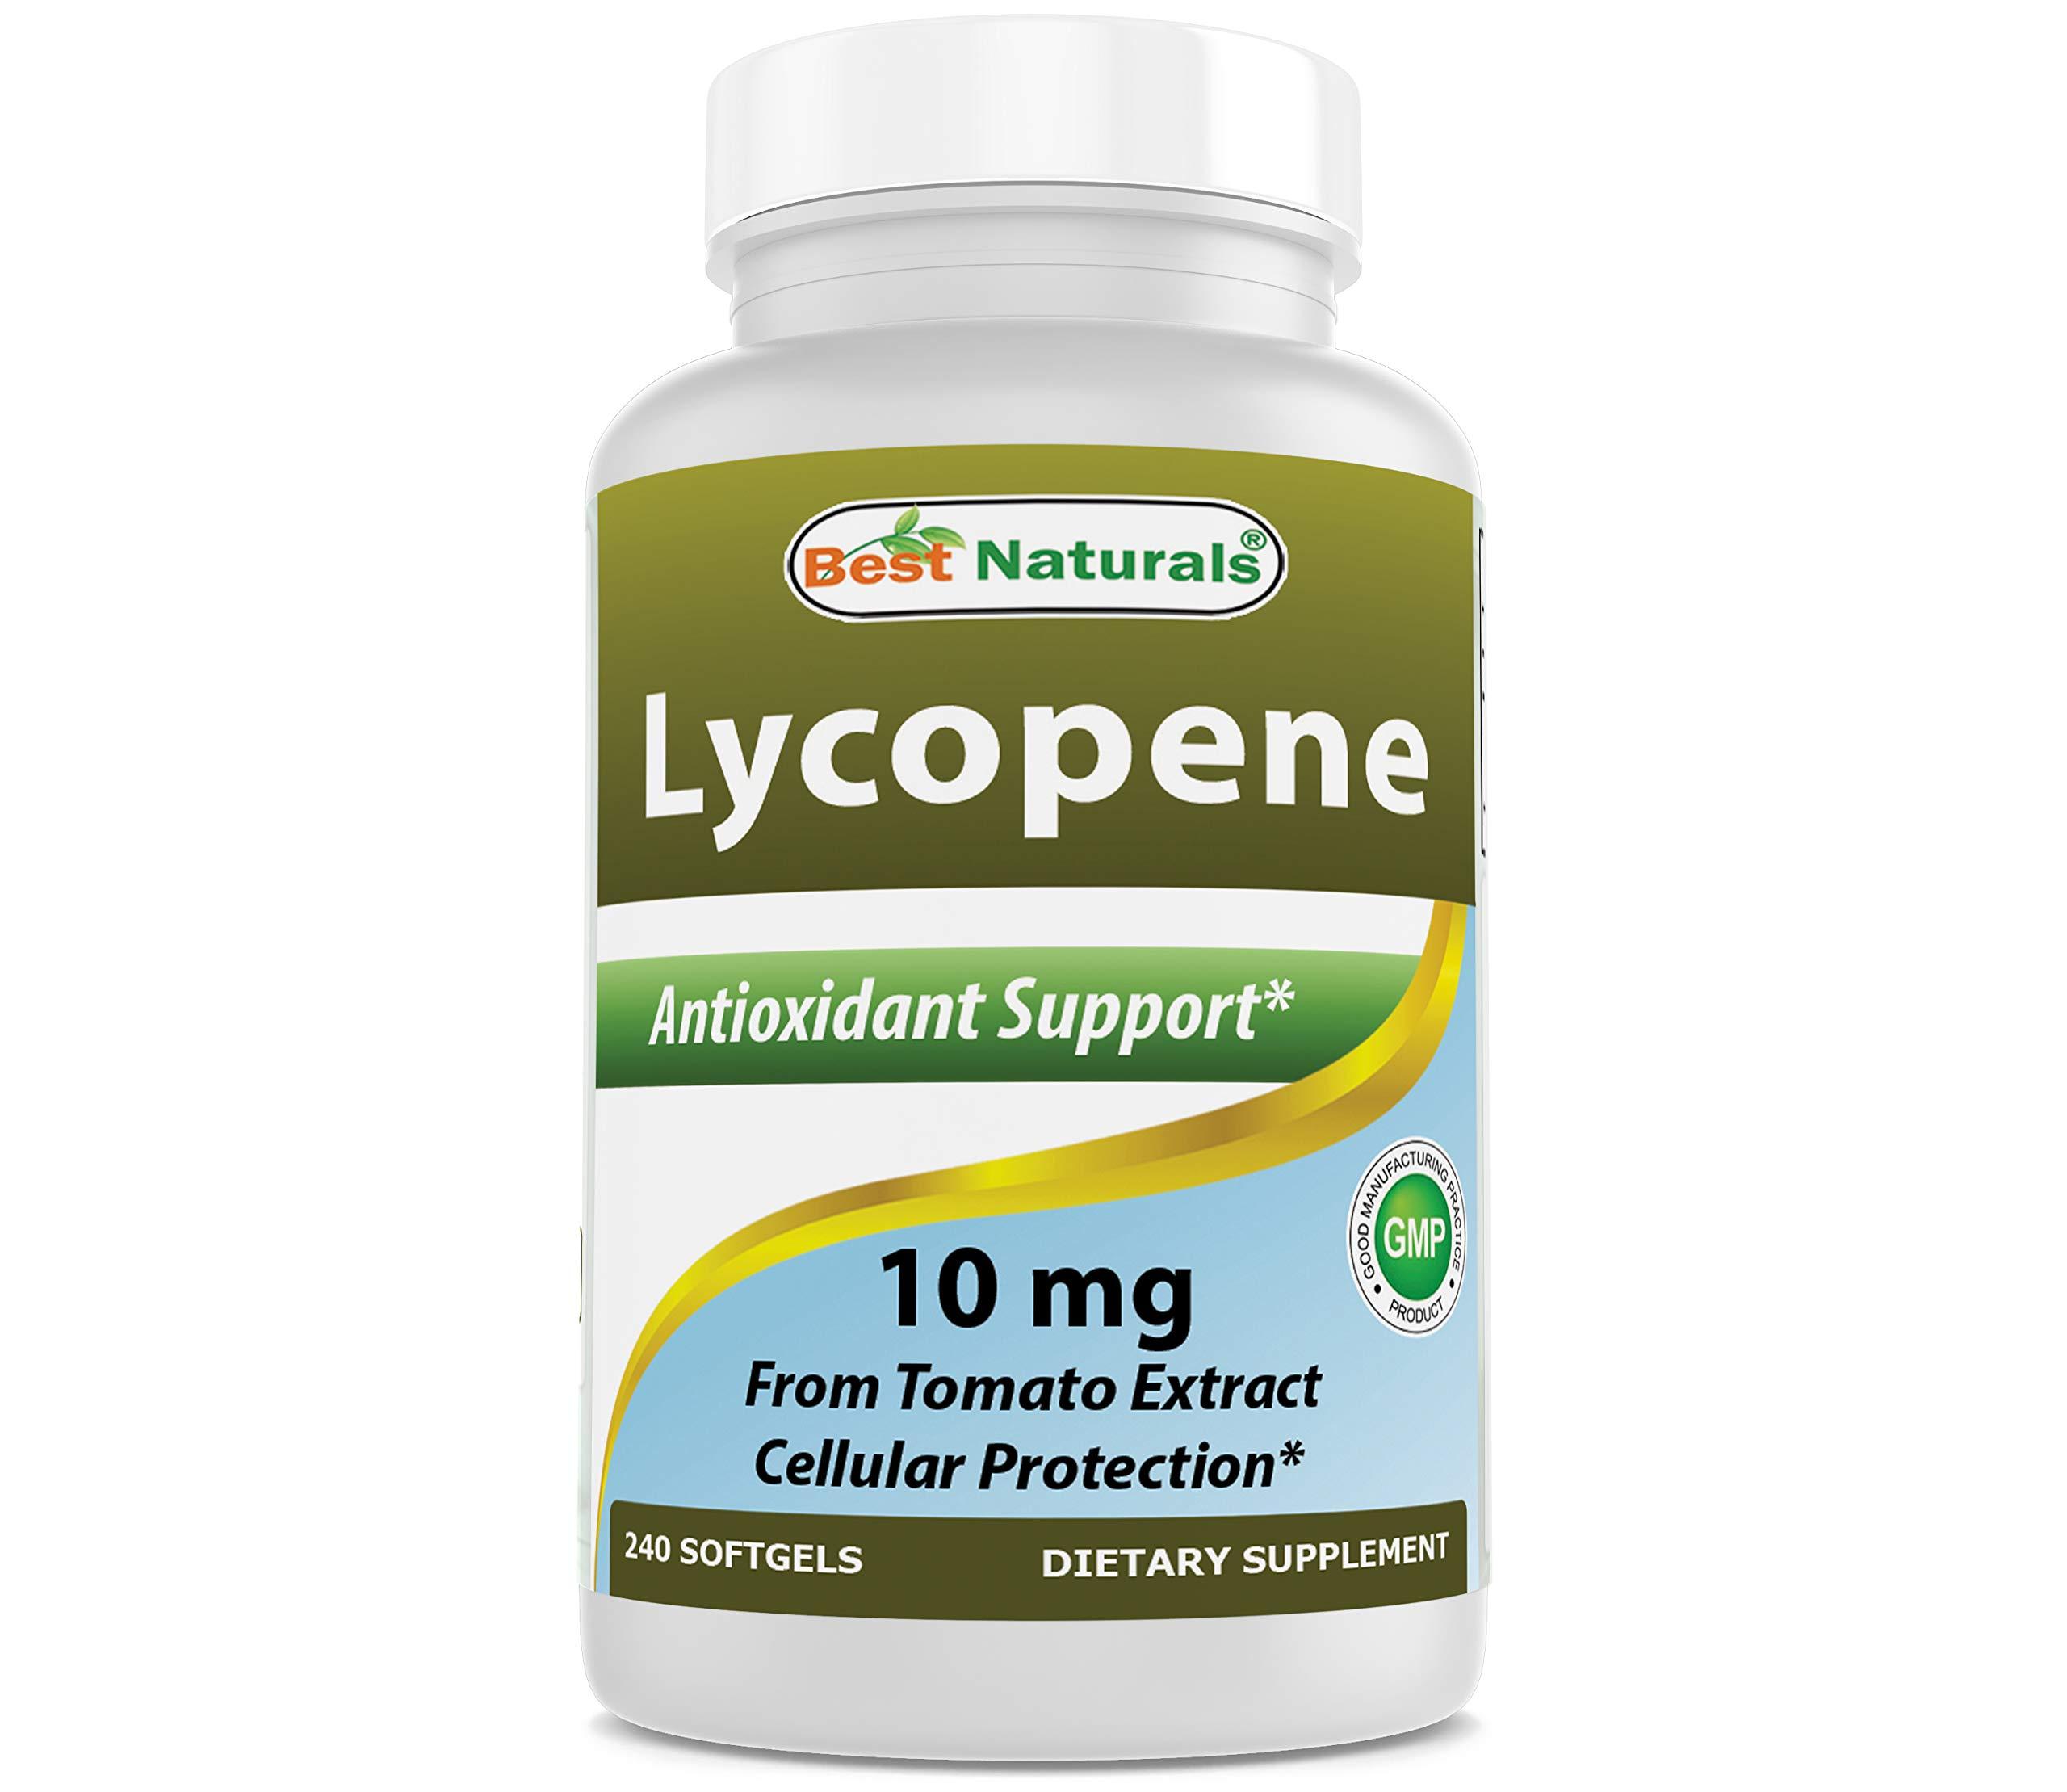 Best Naturals Lycopene 10mg Softgel, 240Count